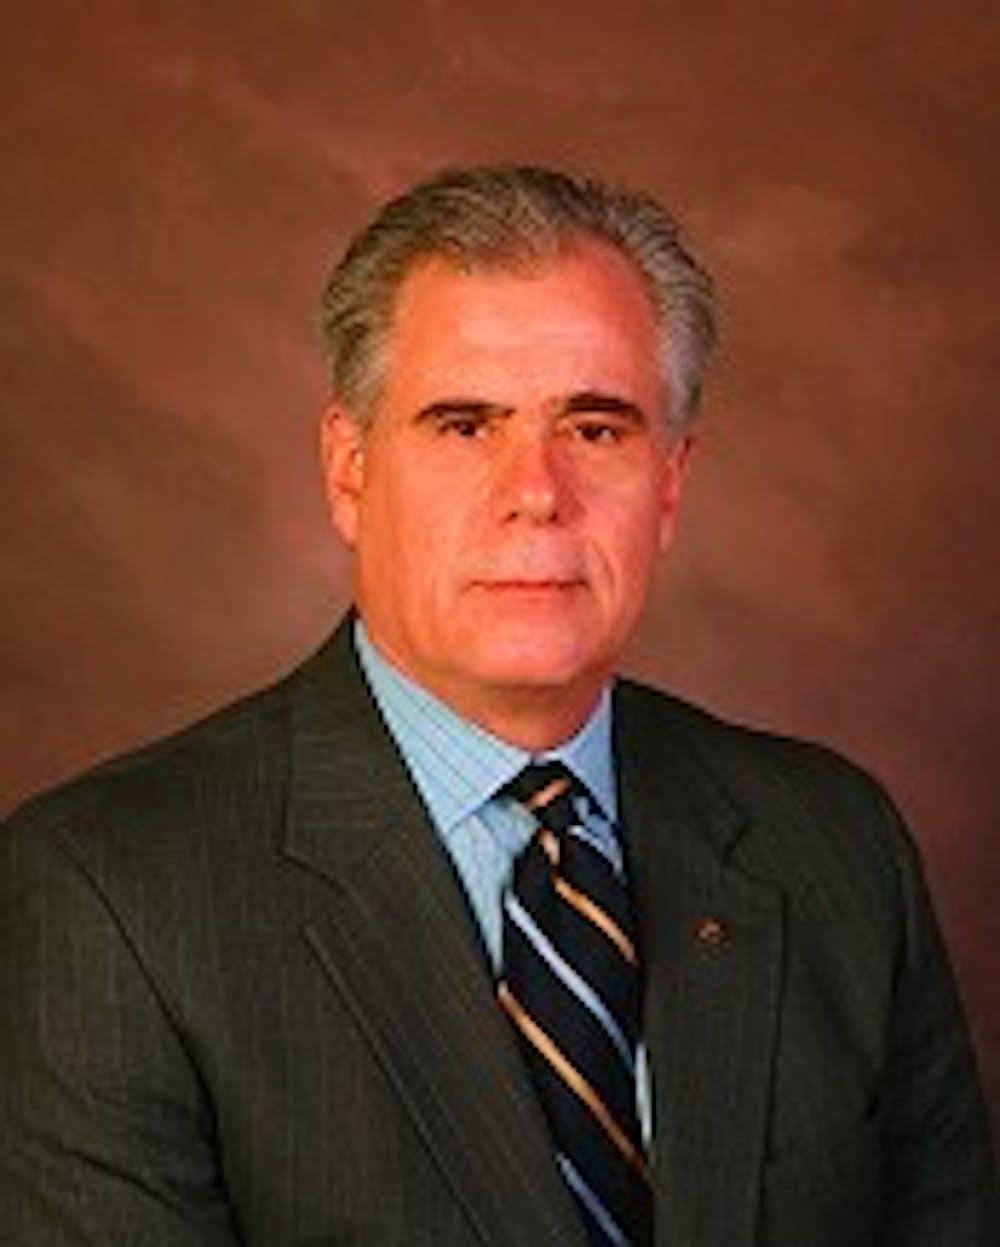 <p>Mike Davis, treasurer of Talawanda school district, passed away due to complications from the novel coronavirus. </p>